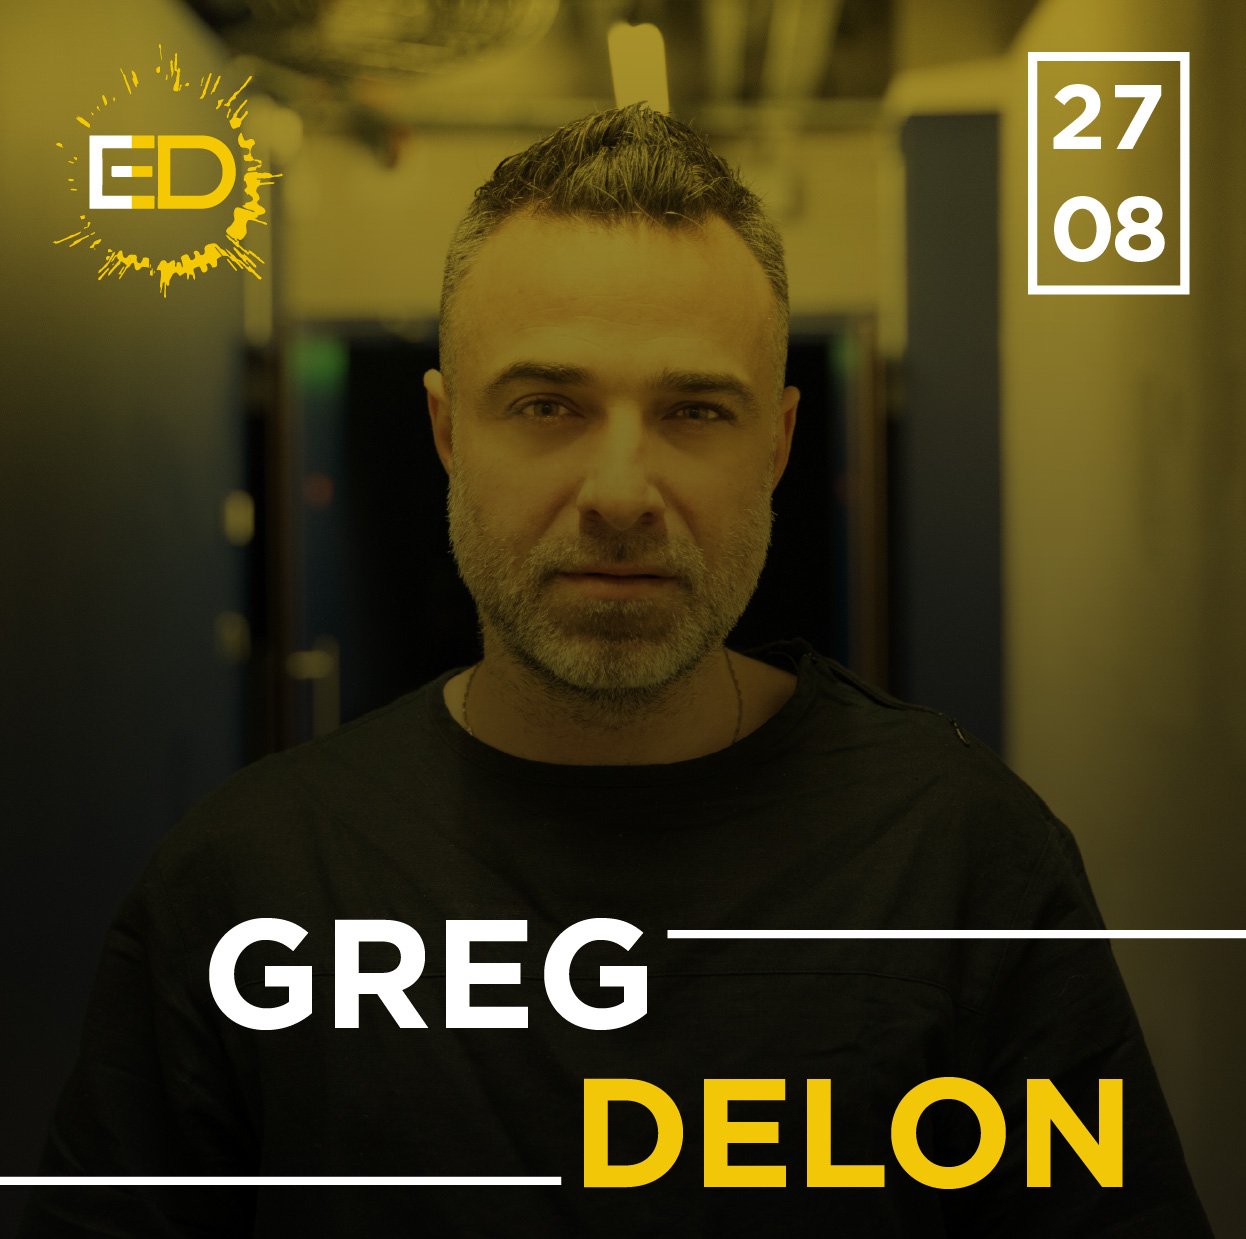 Greg_Delon